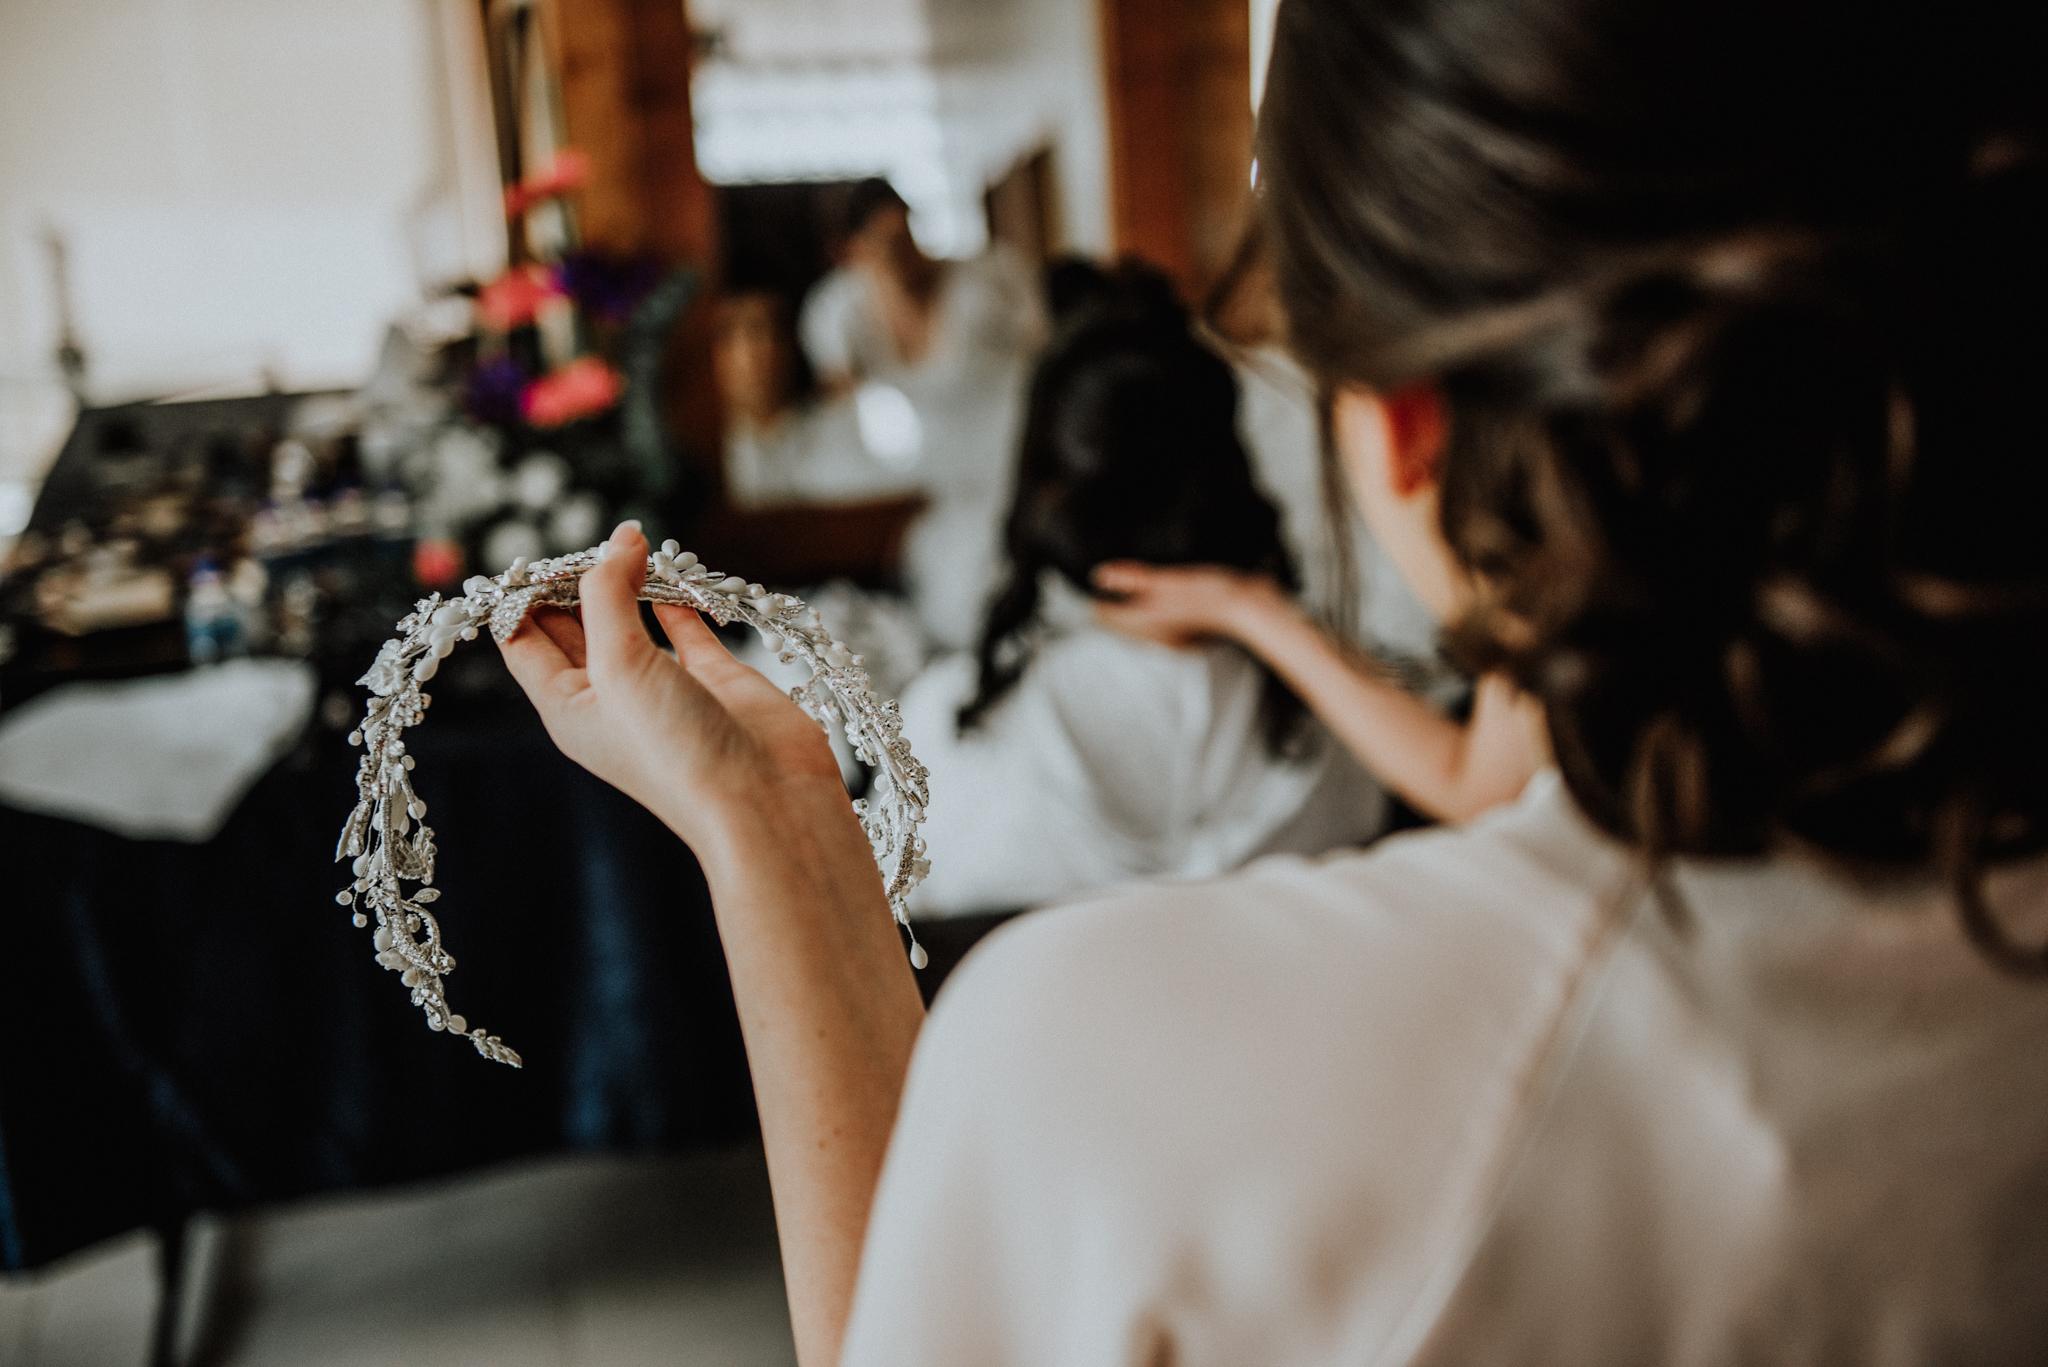 fotografo-de-bodas-guadalajara-fotos-bodas-jalisco-bodas-guanajuato-queretaro-monterrey-cancun-puerto-vallarta-san-miguel-de-allende-los-cabos-boda-destino-wedding-photographer-gdl-mexico-bodas-destino-fotografia-zacatecas-mejor-fotografo-de-bodas-mexico-top-ten-wedding-photography